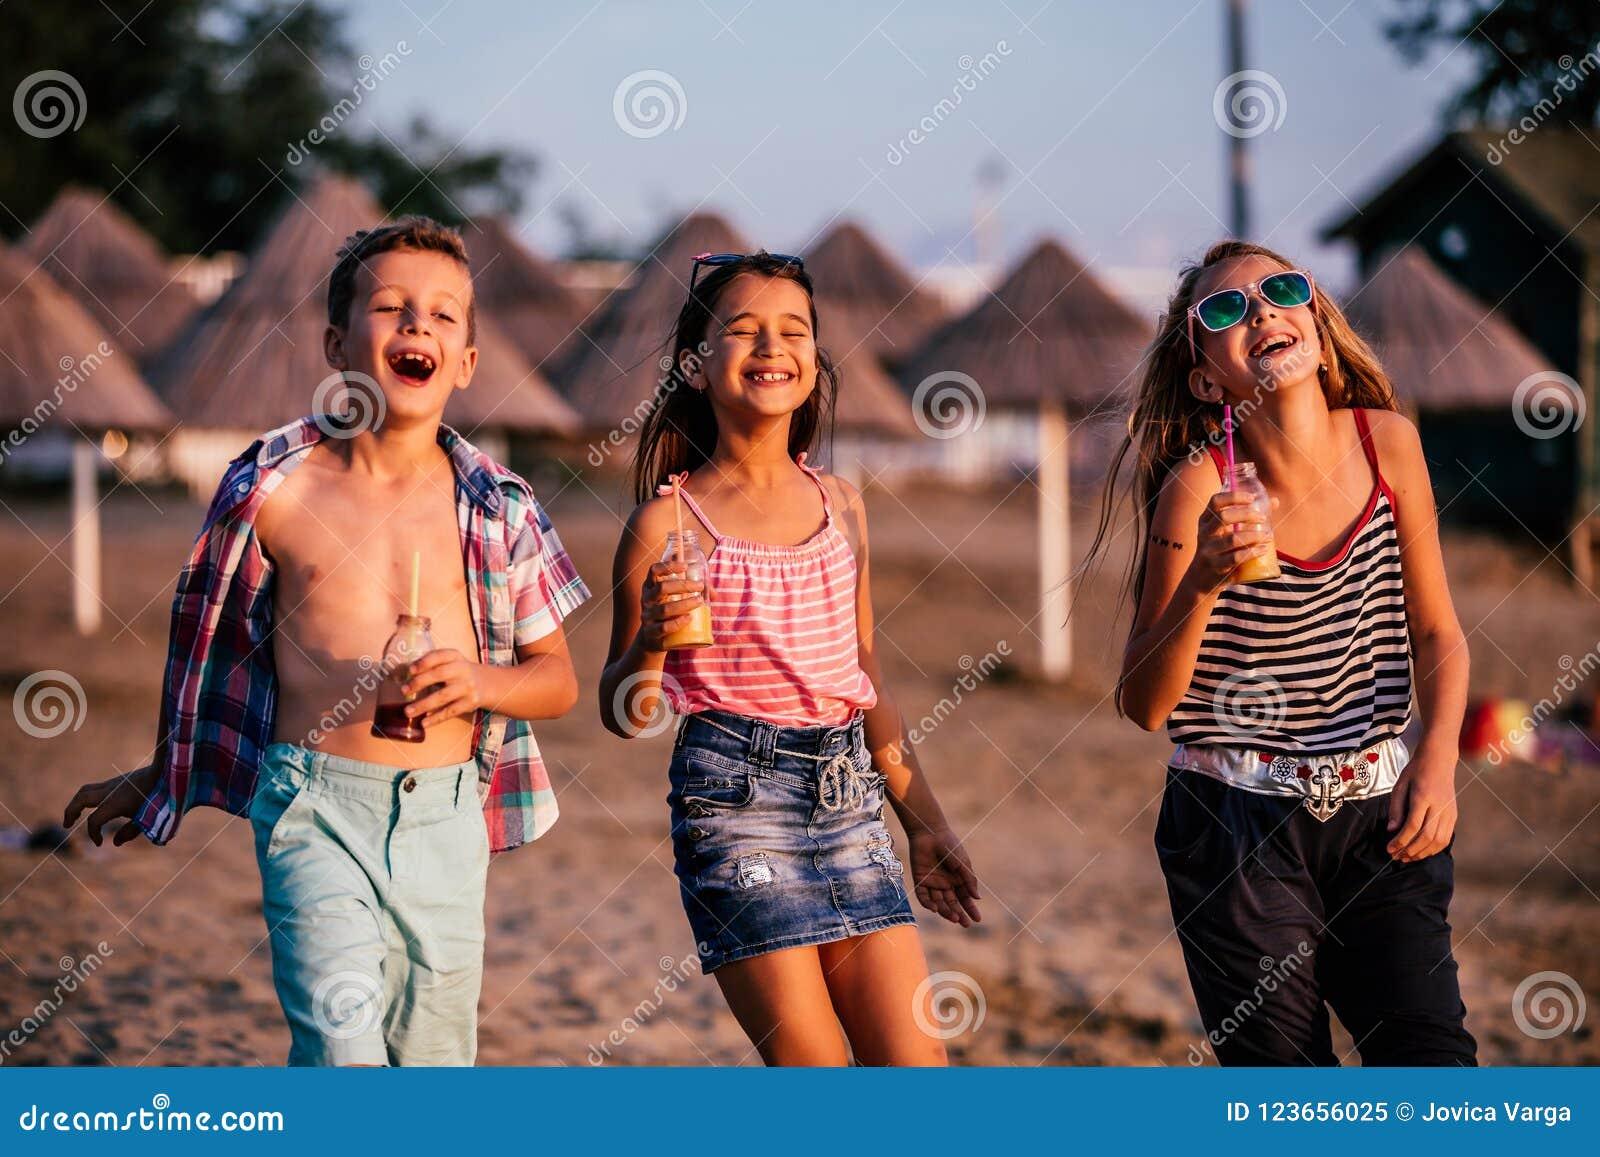 Children having fun while walking along a sandy beach